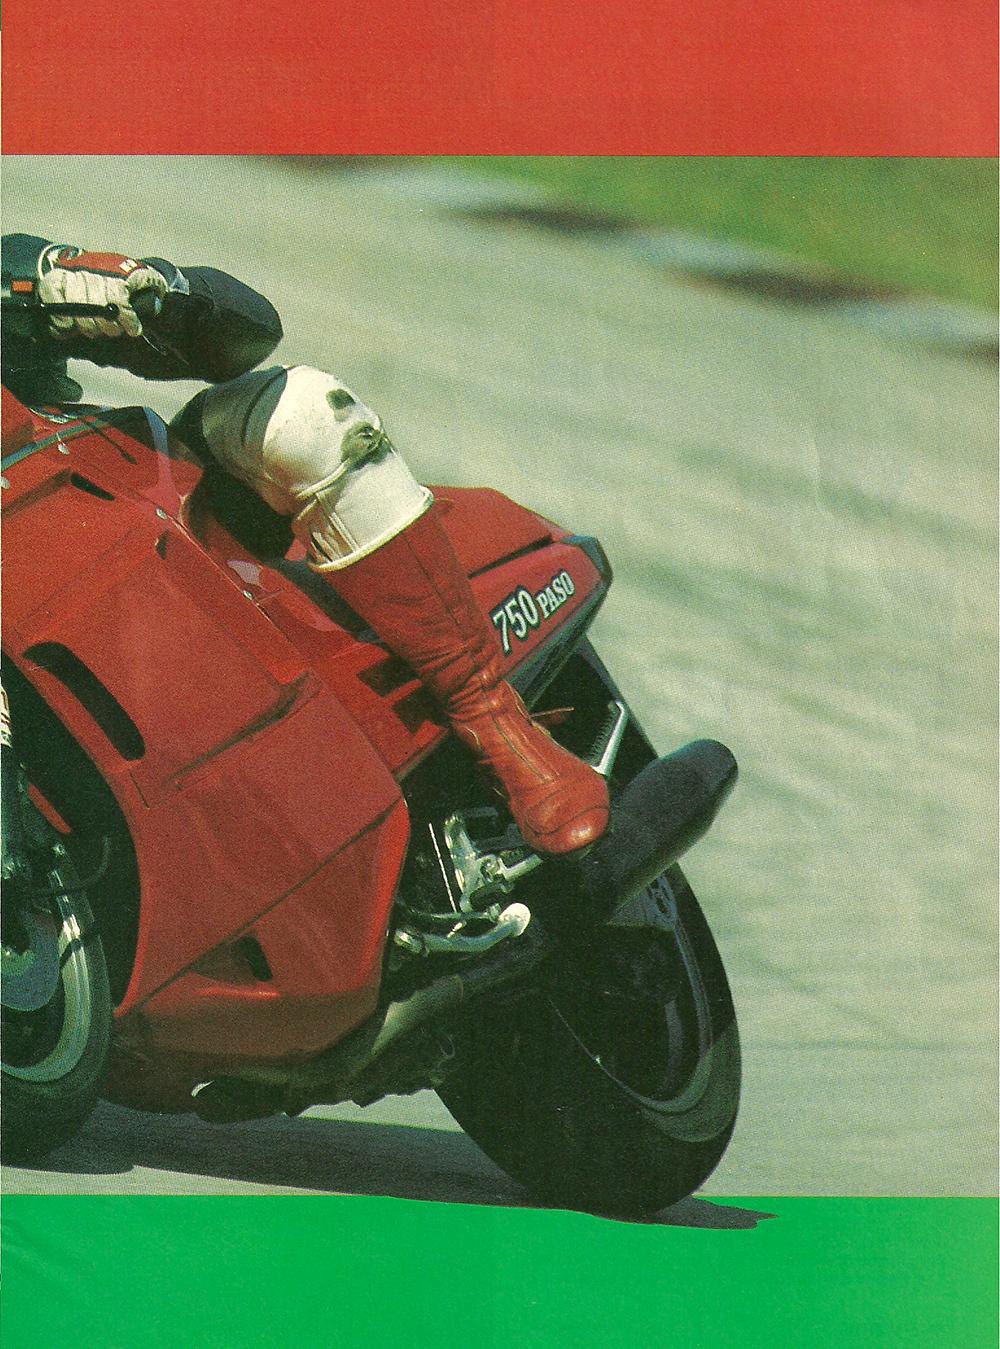 1986 Cagiva-Ducati 750 Paso road test 02.jpg